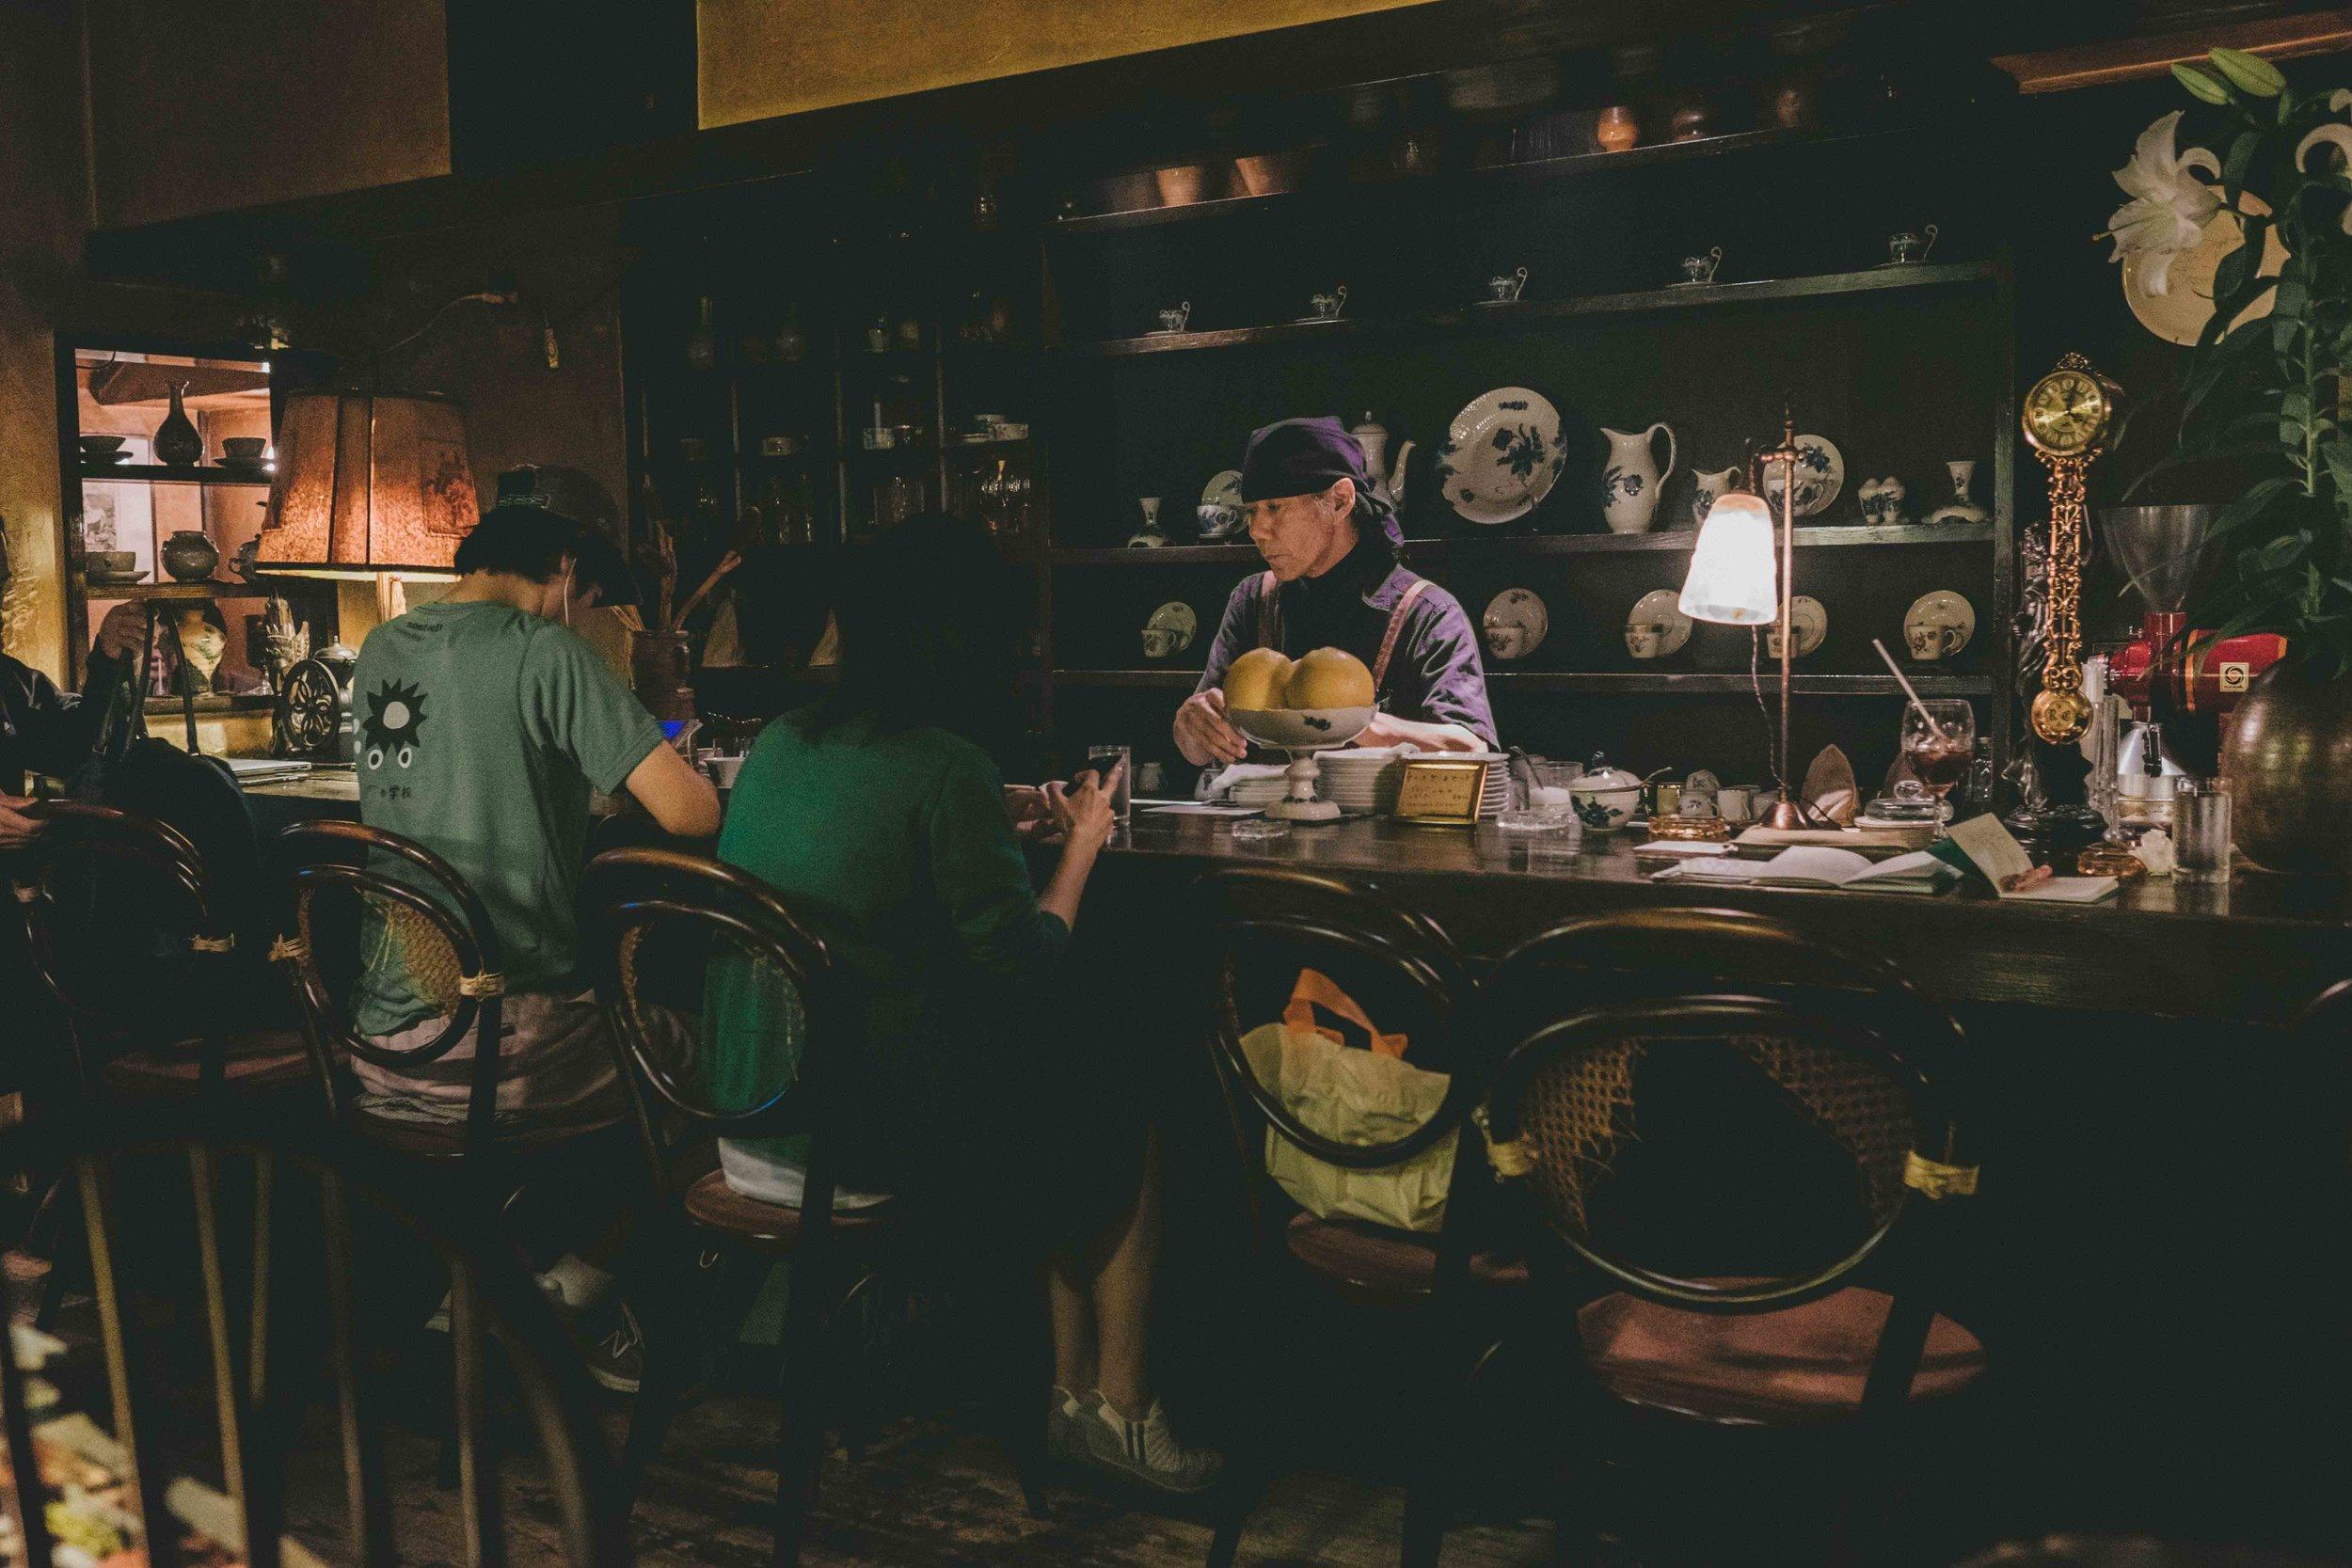 Café Trois Chambres . A pleasant time warp in a café run by a lovely elderly couple.